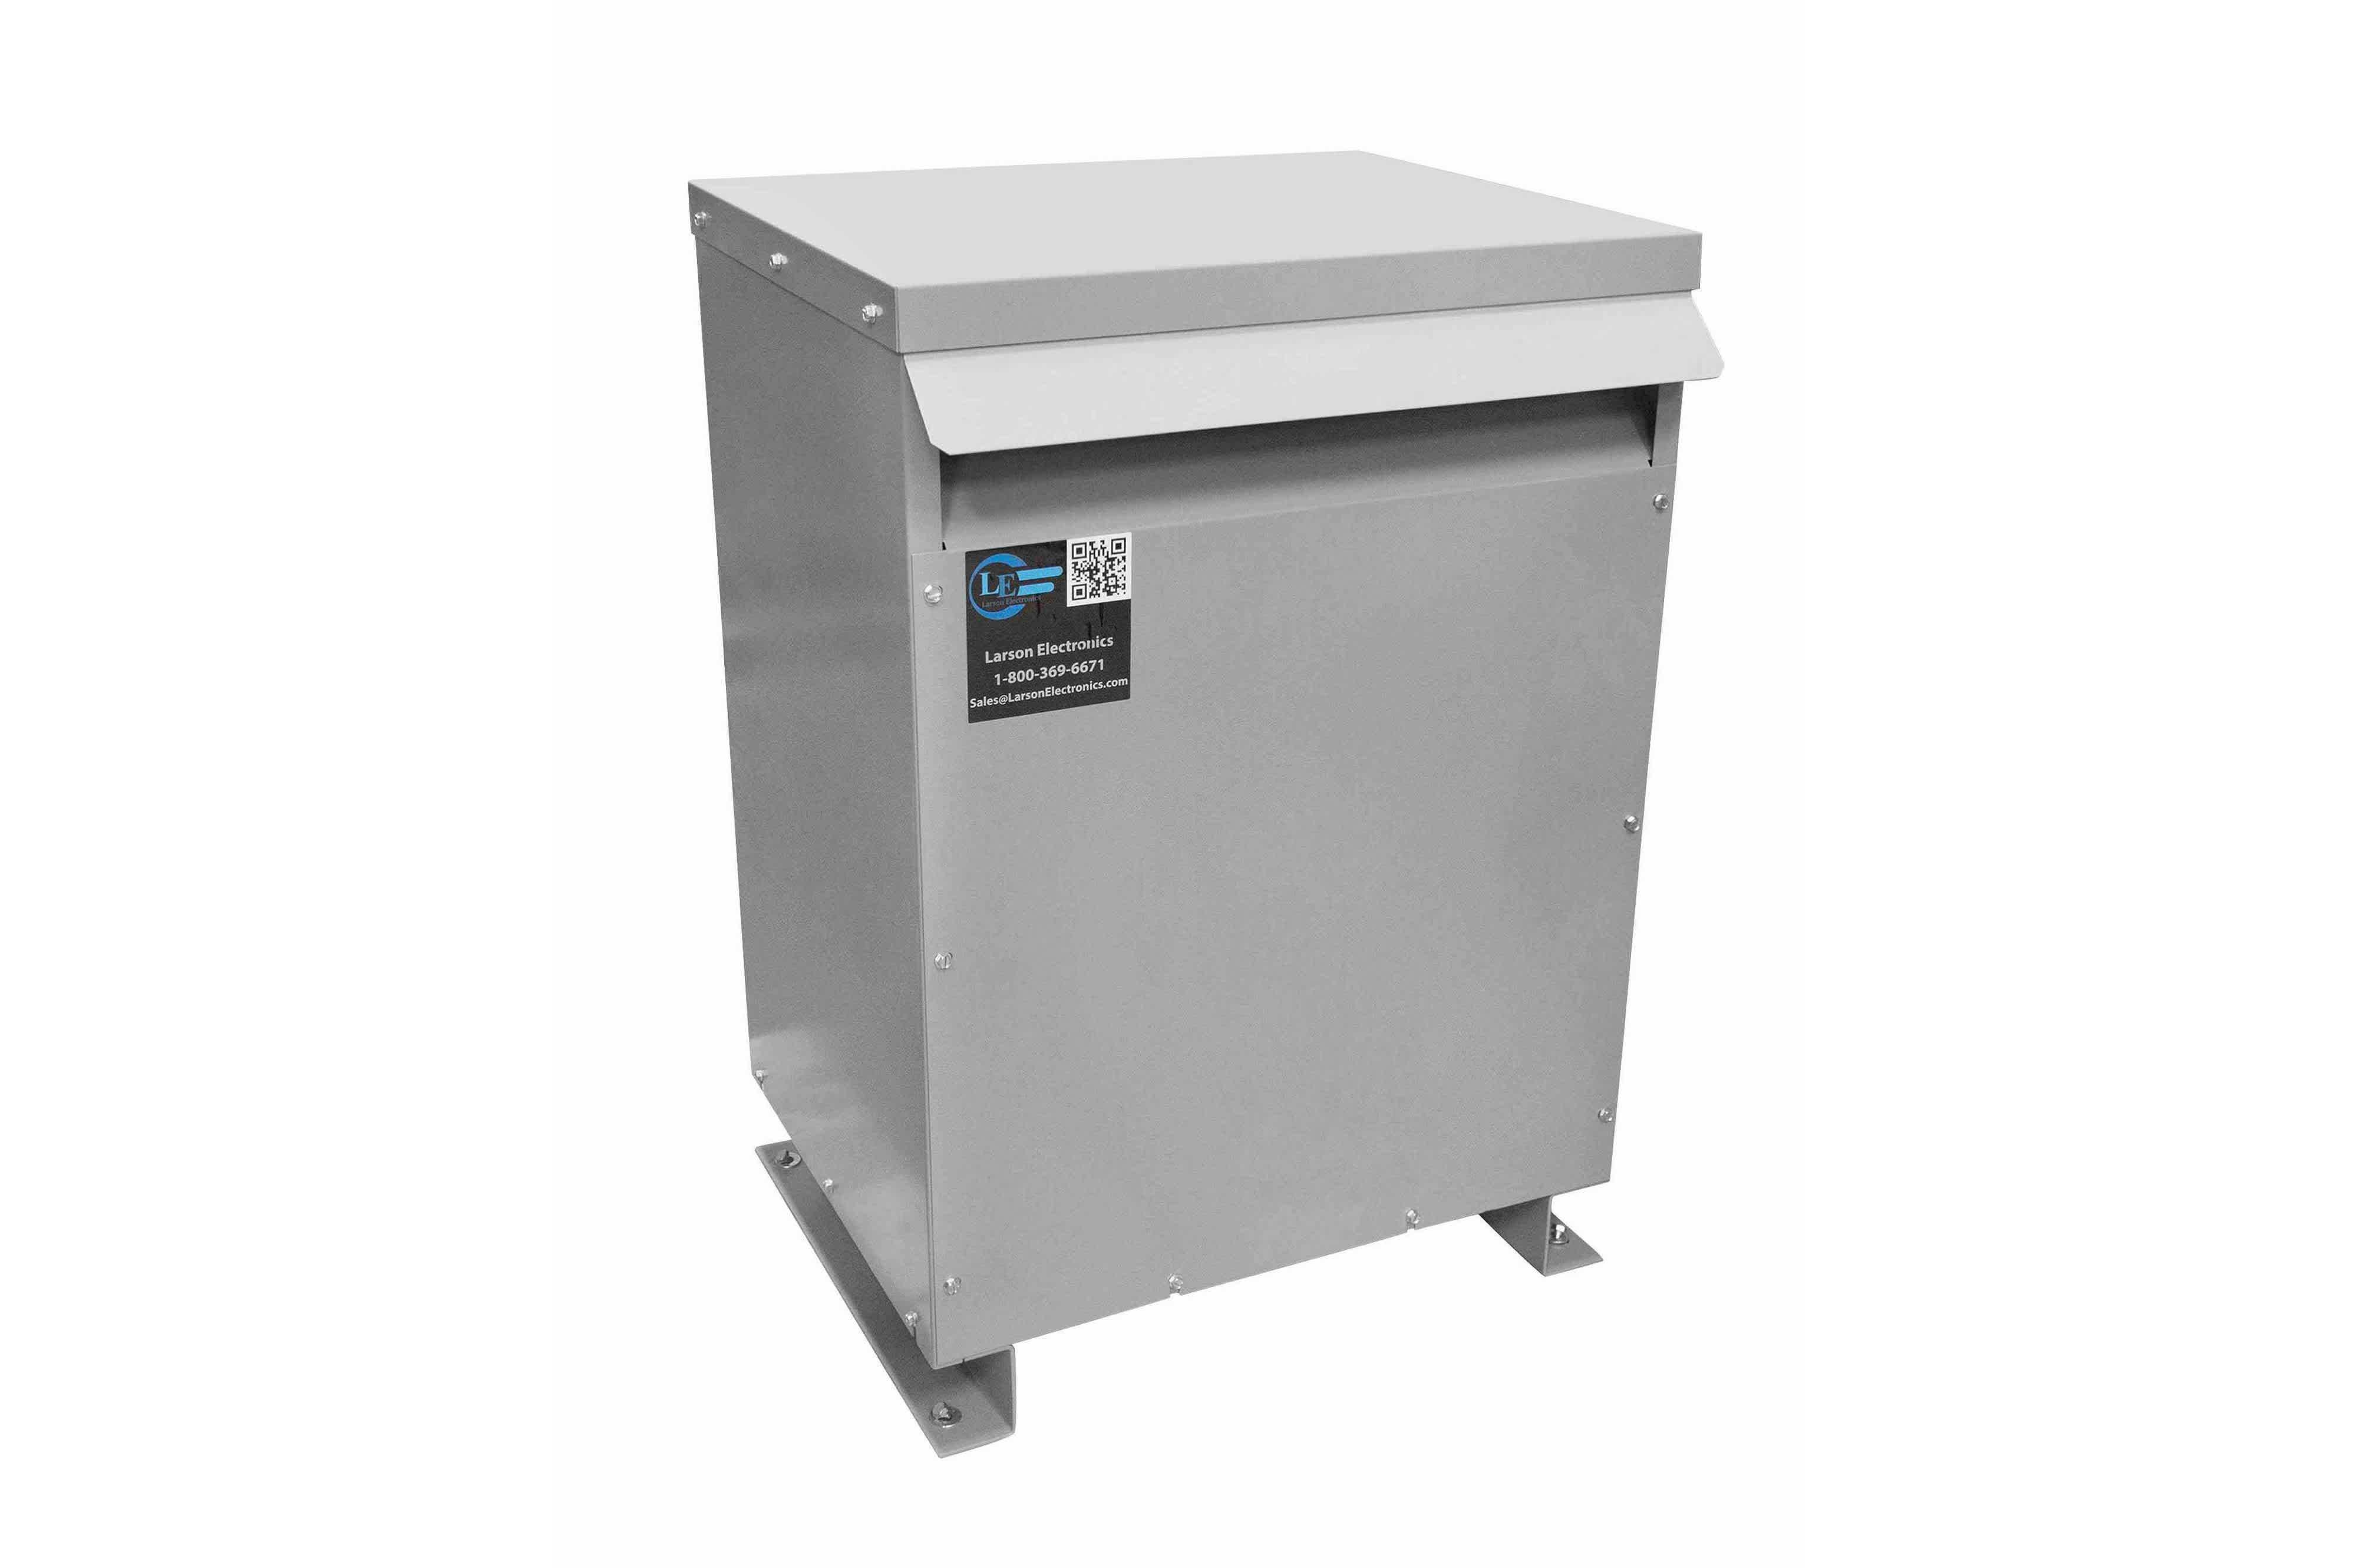 28 kVA 3PH DOE Transformer, 460V Delta Primary, 208Y/120 Wye-N Secondary, N3R, Ventilated, 60 Hz